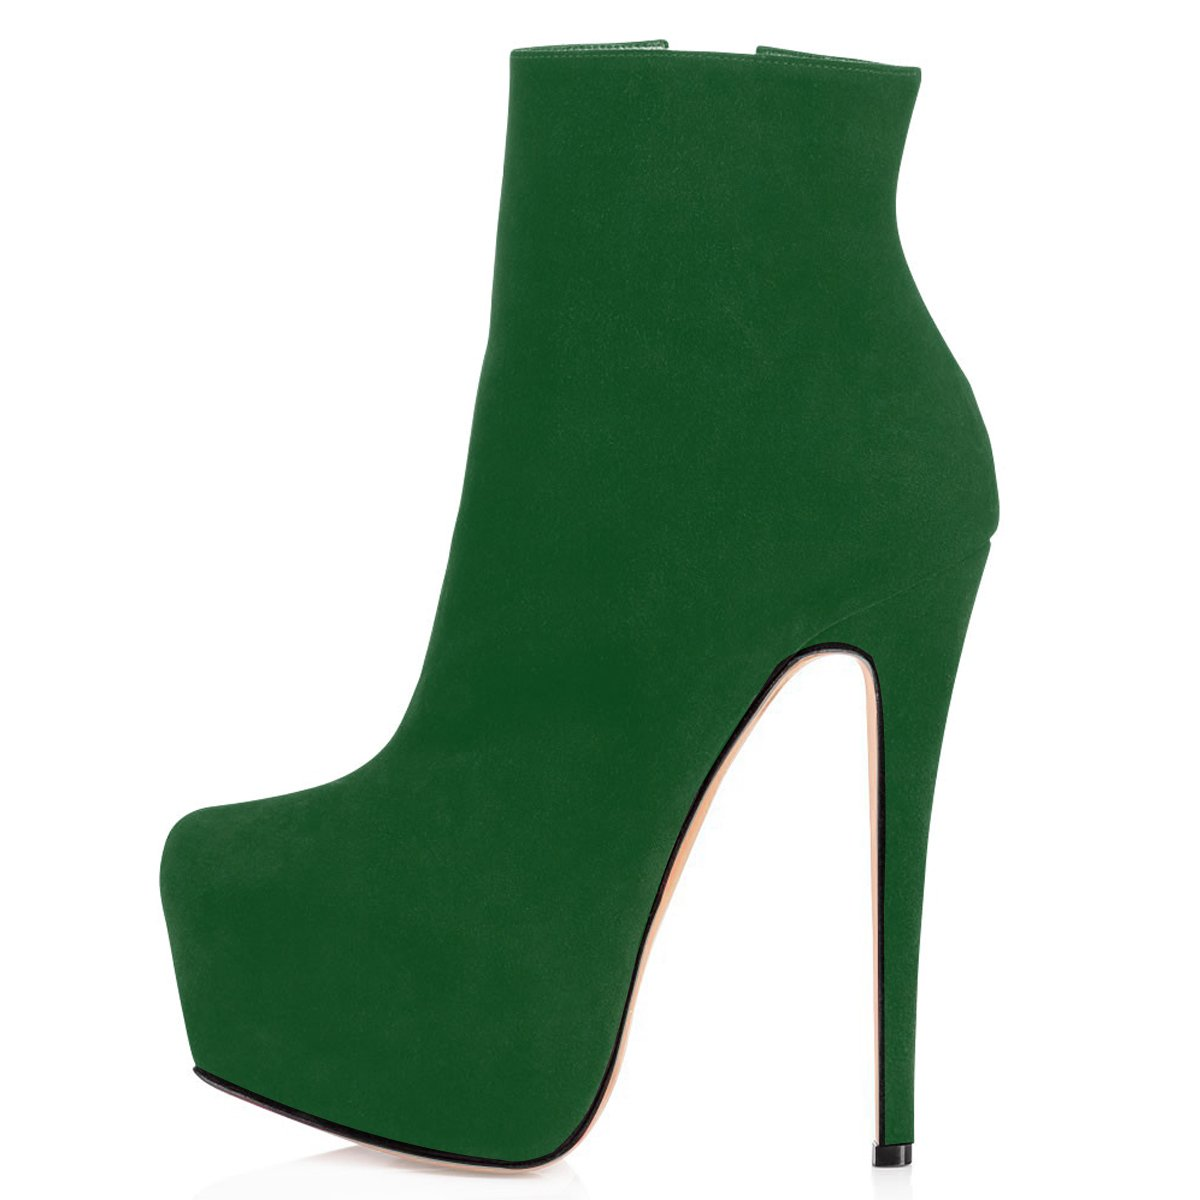 ELASHE Ankle Boots | 15cmTrendige Damen Stiefeletten | Plateau Stiefel mit Absatz37 EU|Gr眉n